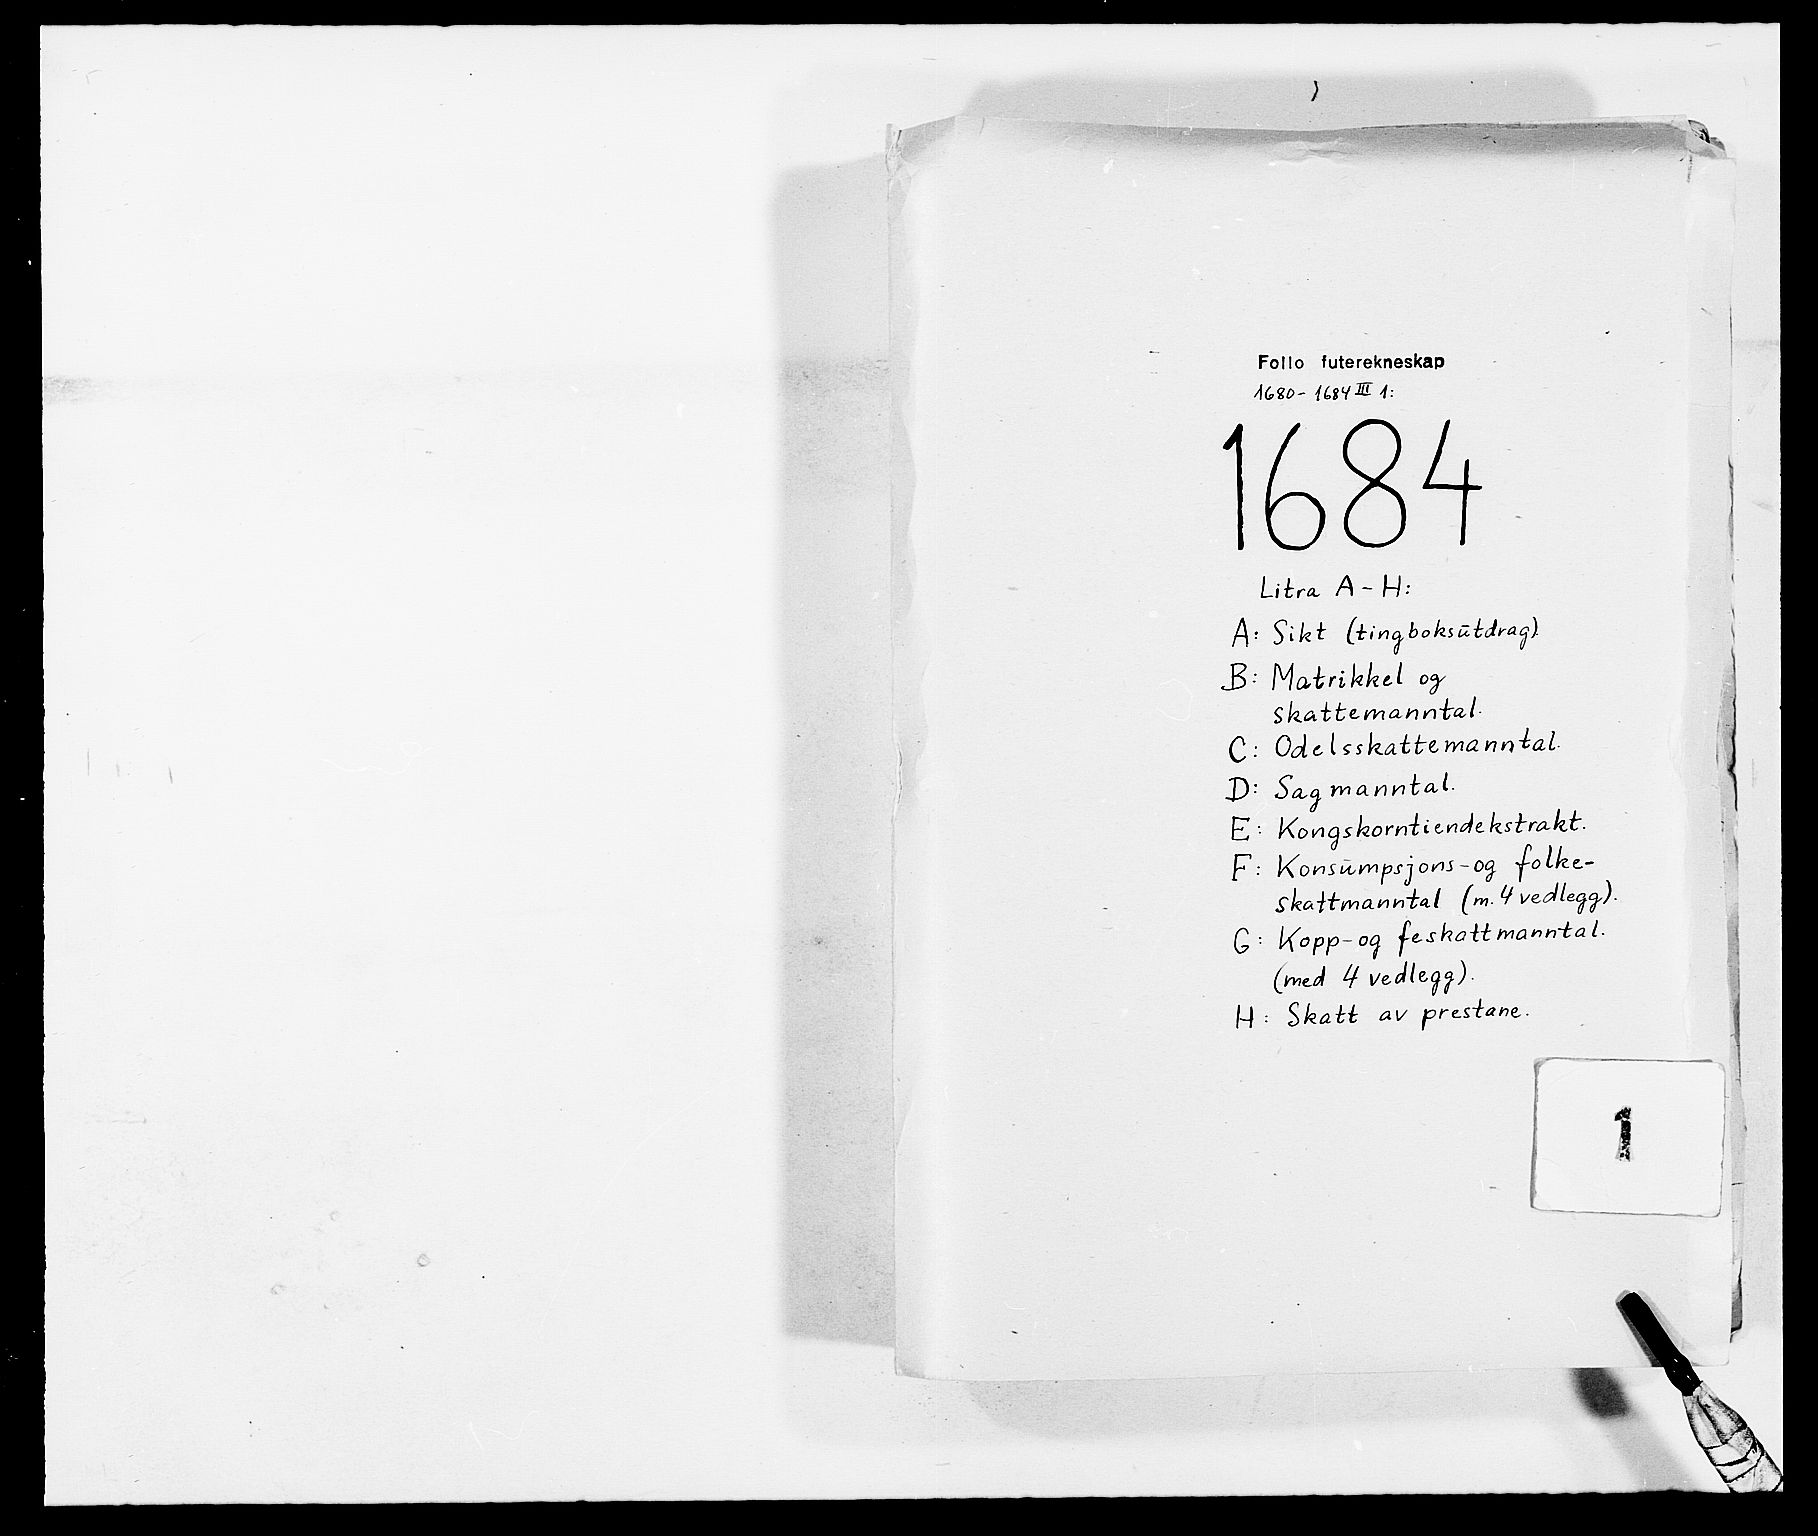 RA, Rentekammeret inntil 1814, Reviderte regnskaper, Fogderegnskap, R09/L0431: Fogderegnskap Follo, 1684, s. 1